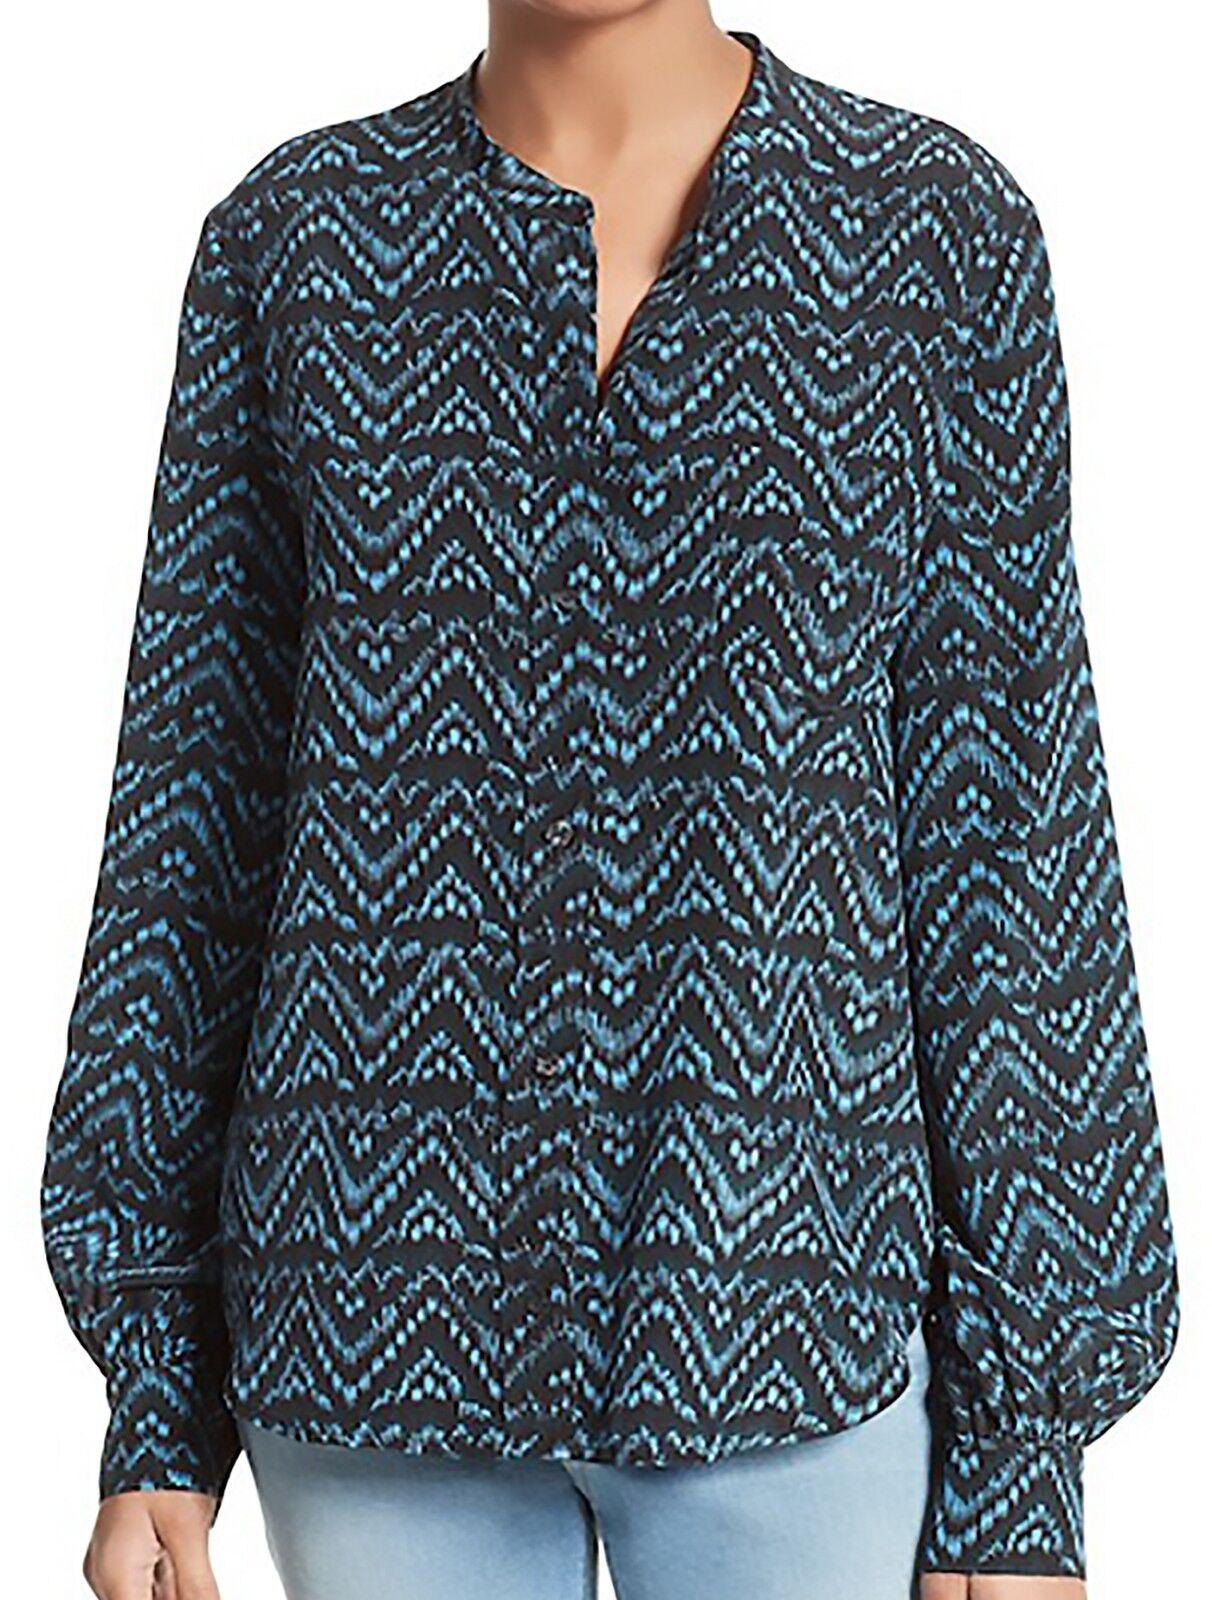 NWT New A.L.C. Blau Walter Print 100% Cotton Blouse Shirt Top Woherren Größe M